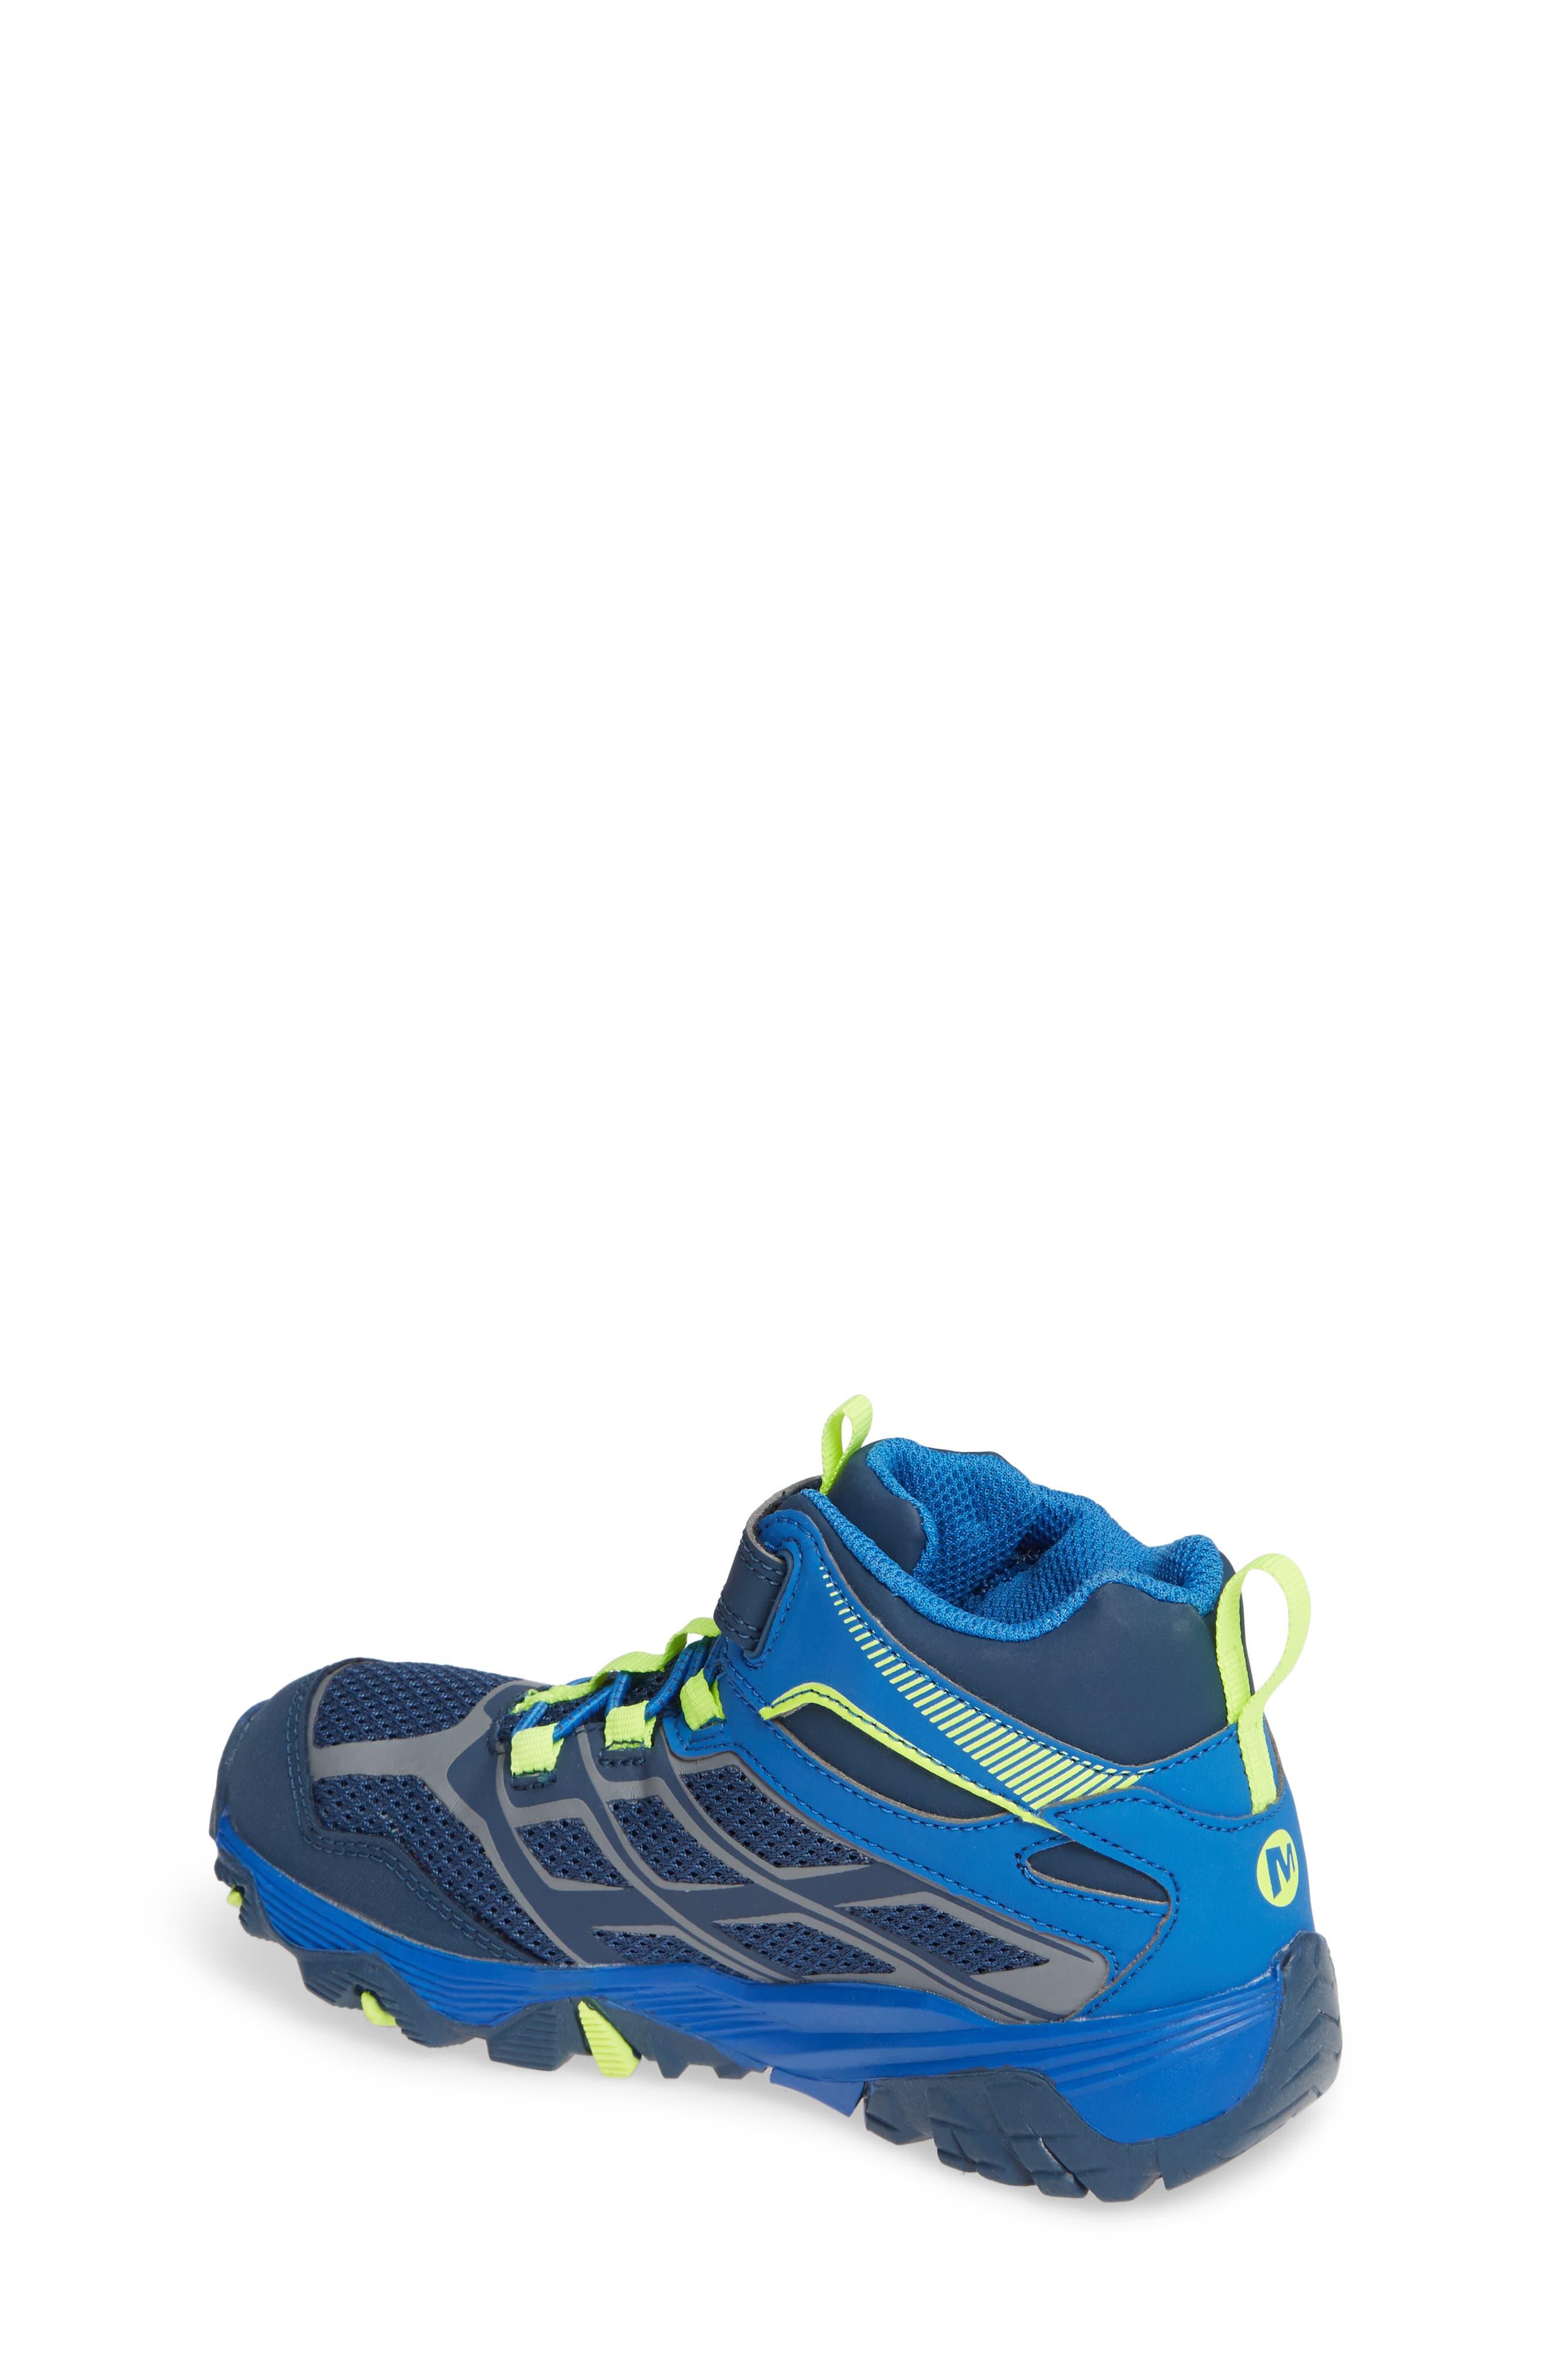 MERRELL, Moab FST Mid Top Waterproof Sneaker Boot, Alternate thumbnail 2, color, NAVY/ COBALT